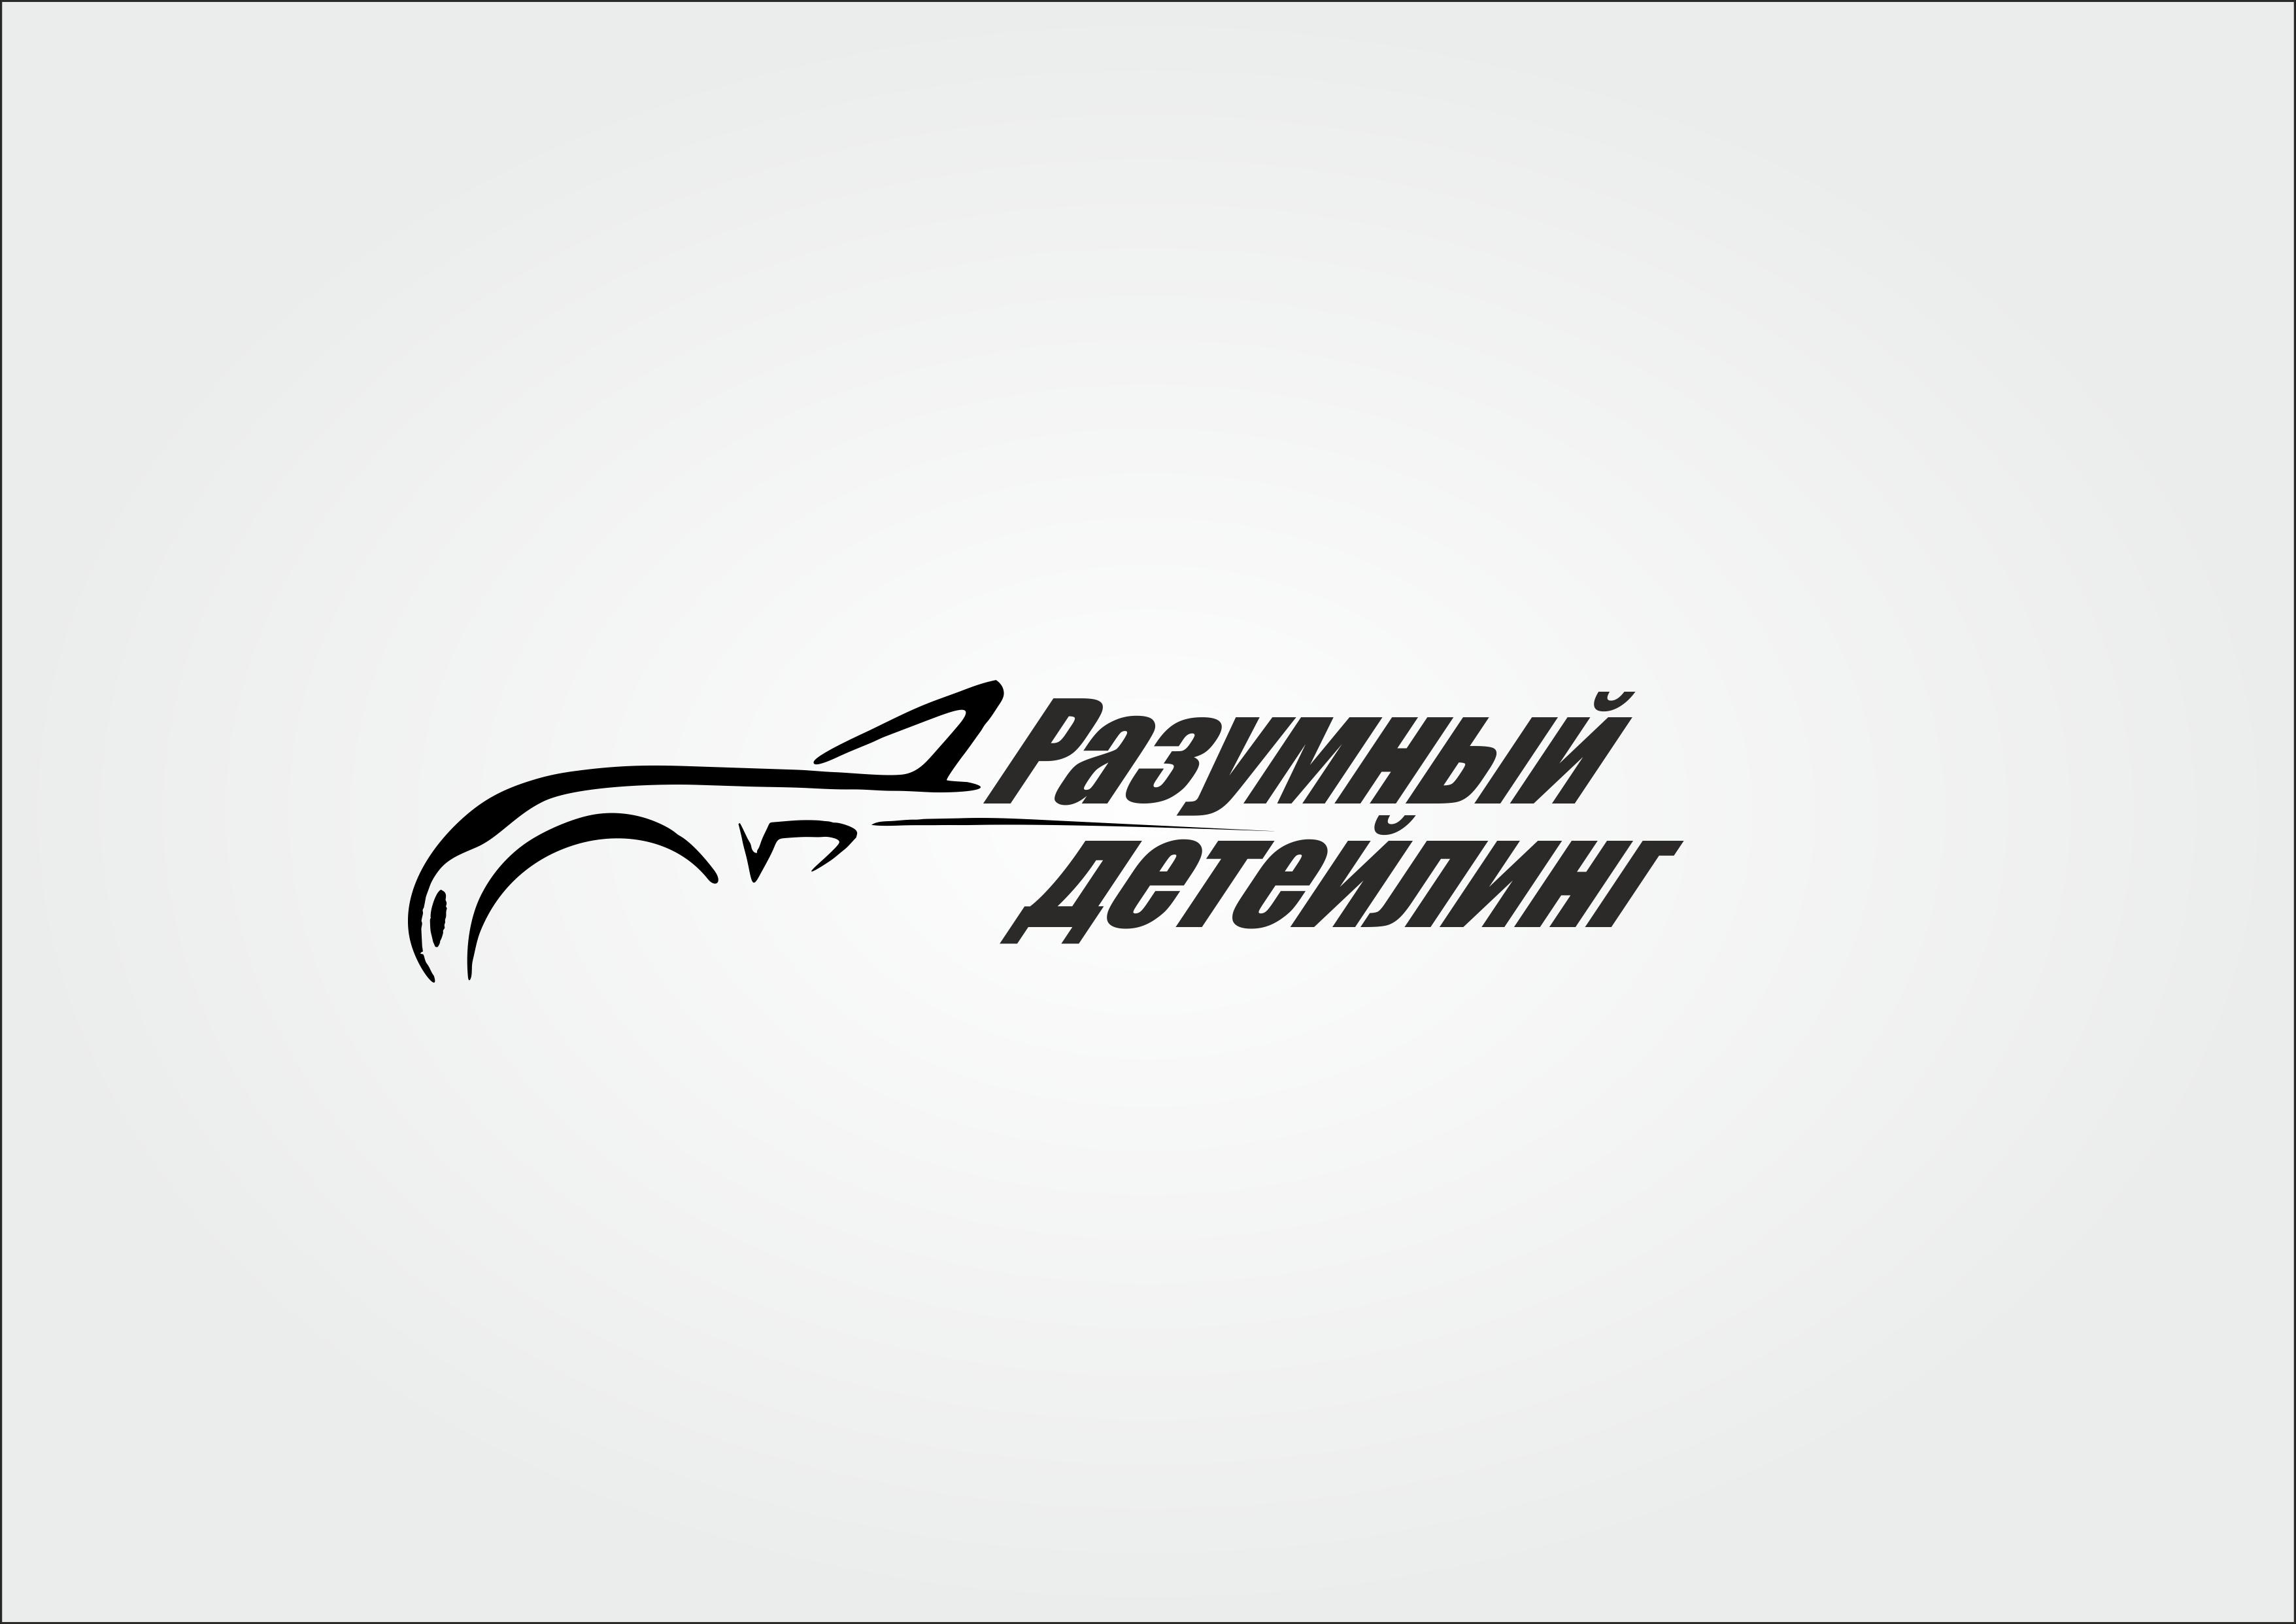 Ребрендинг логотипа  фото f_5785adcc578bdecc.png